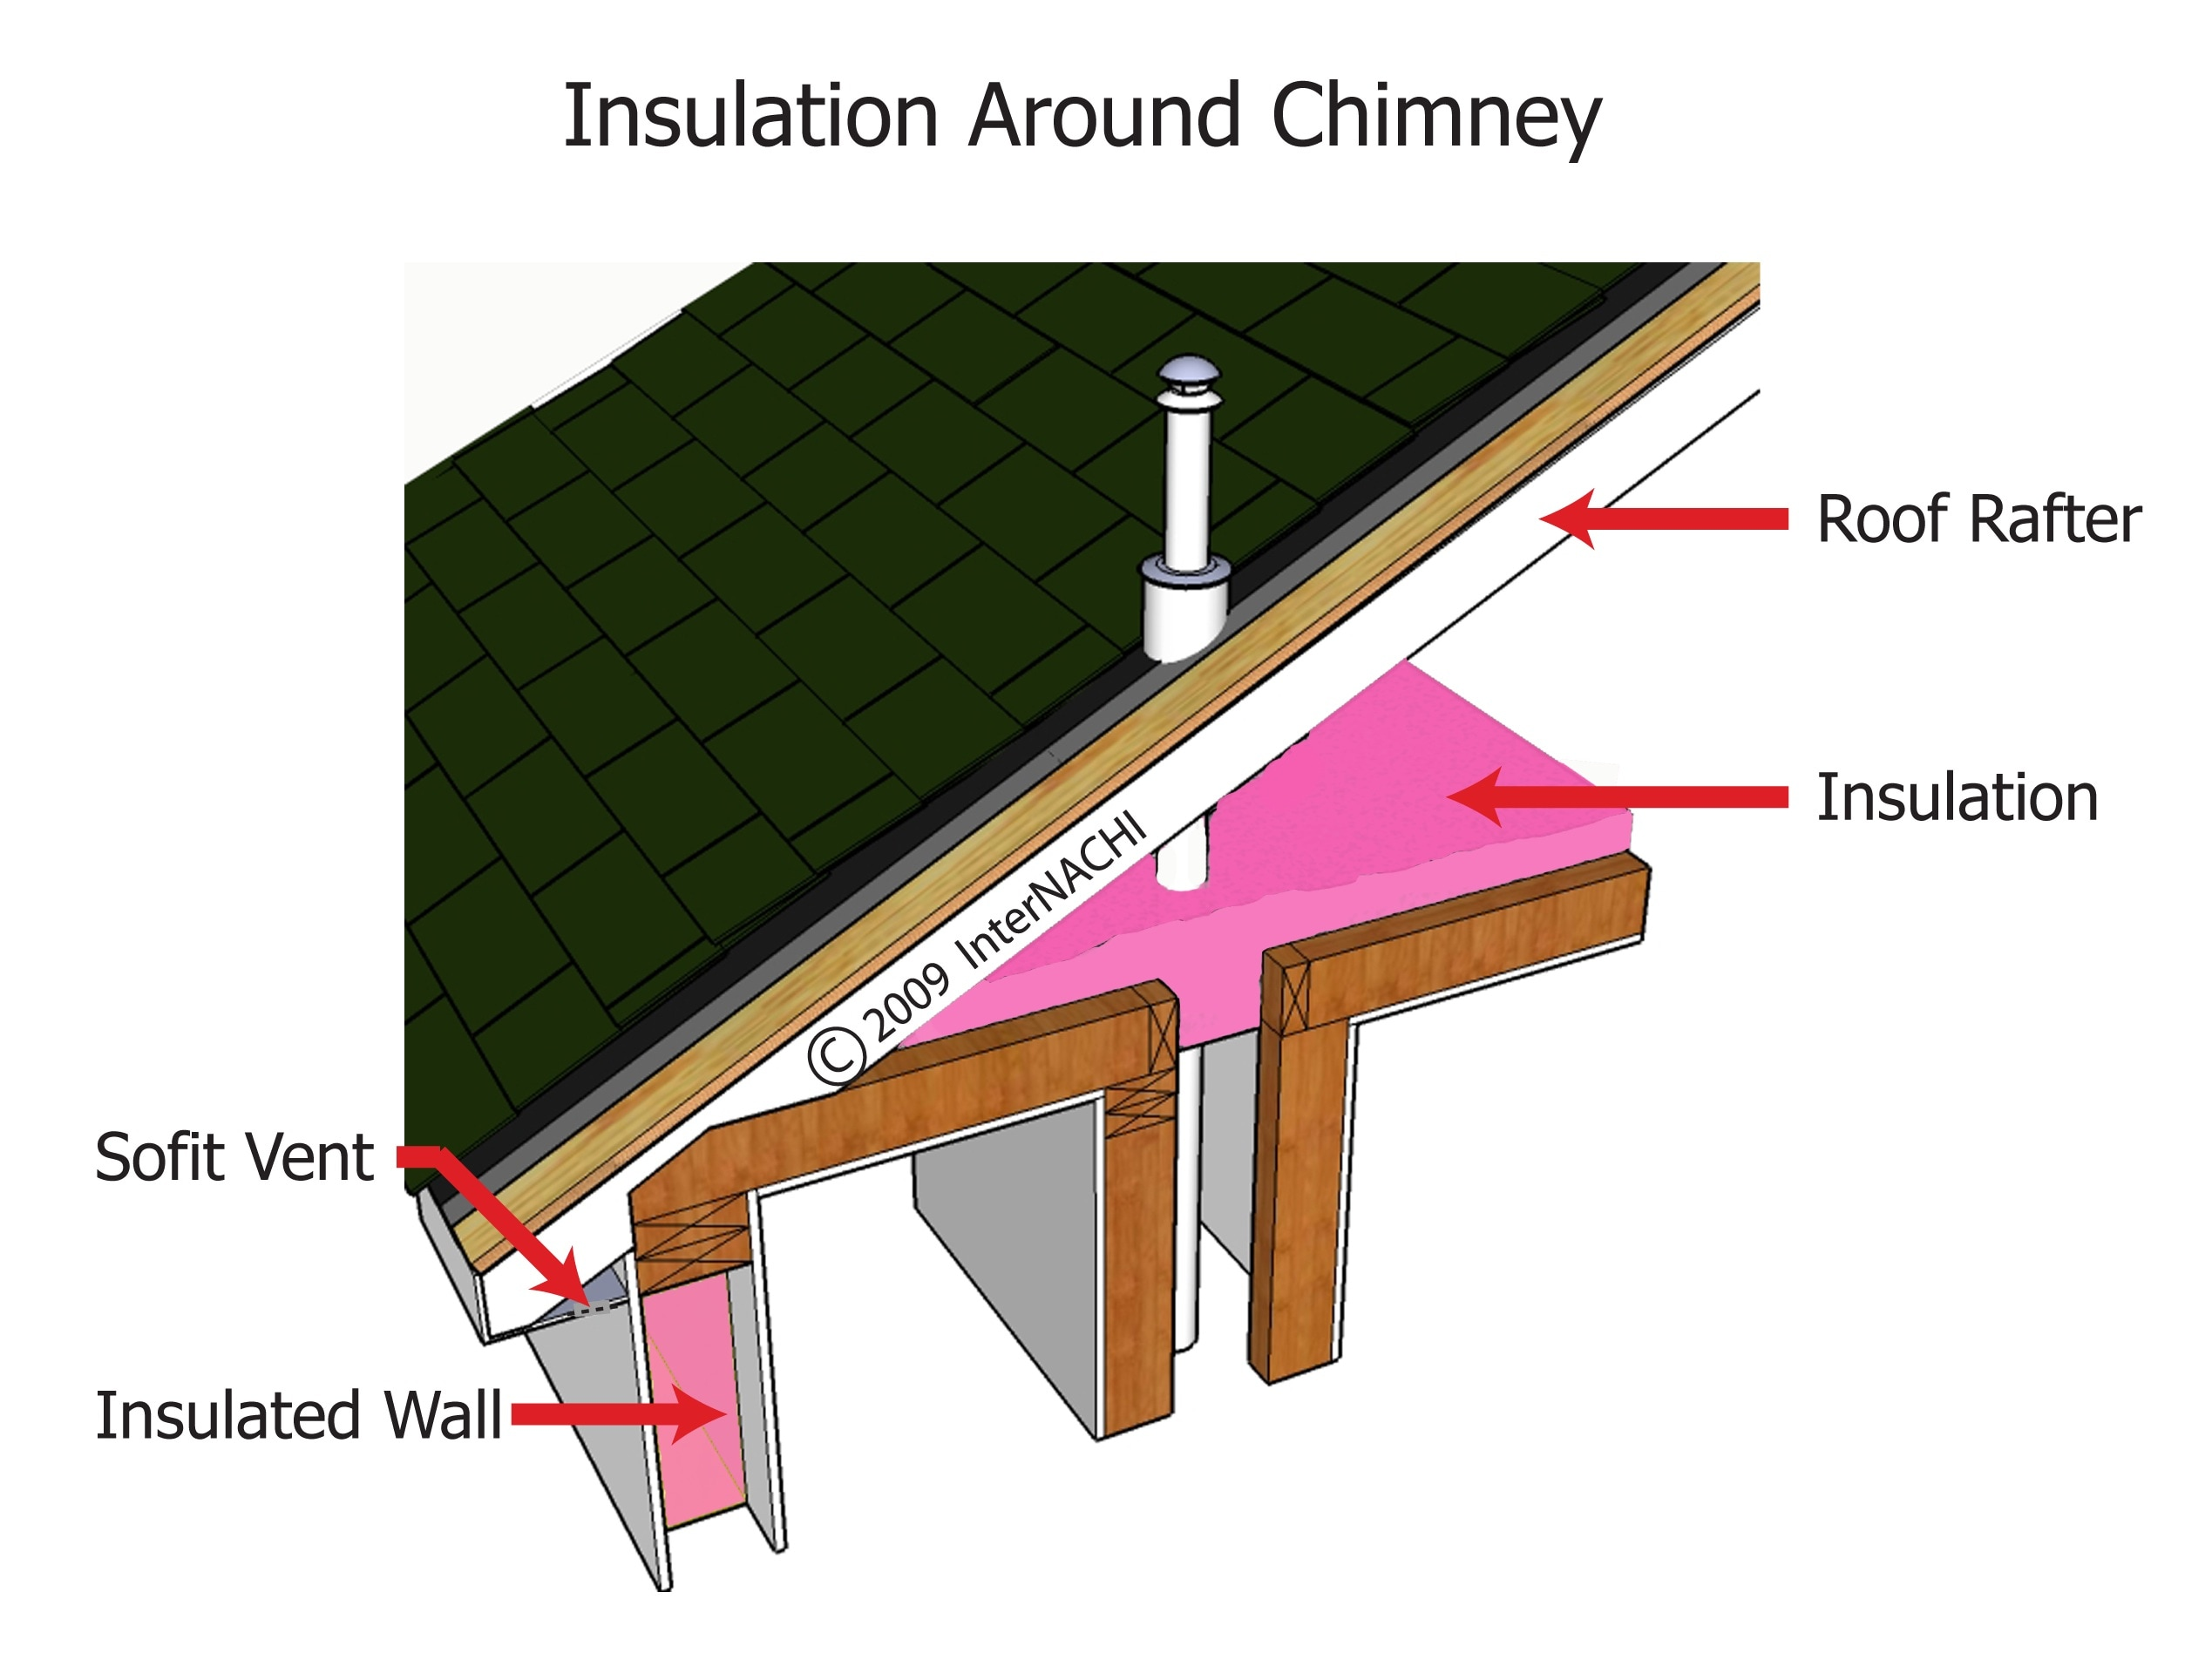 Insulation around chimney.